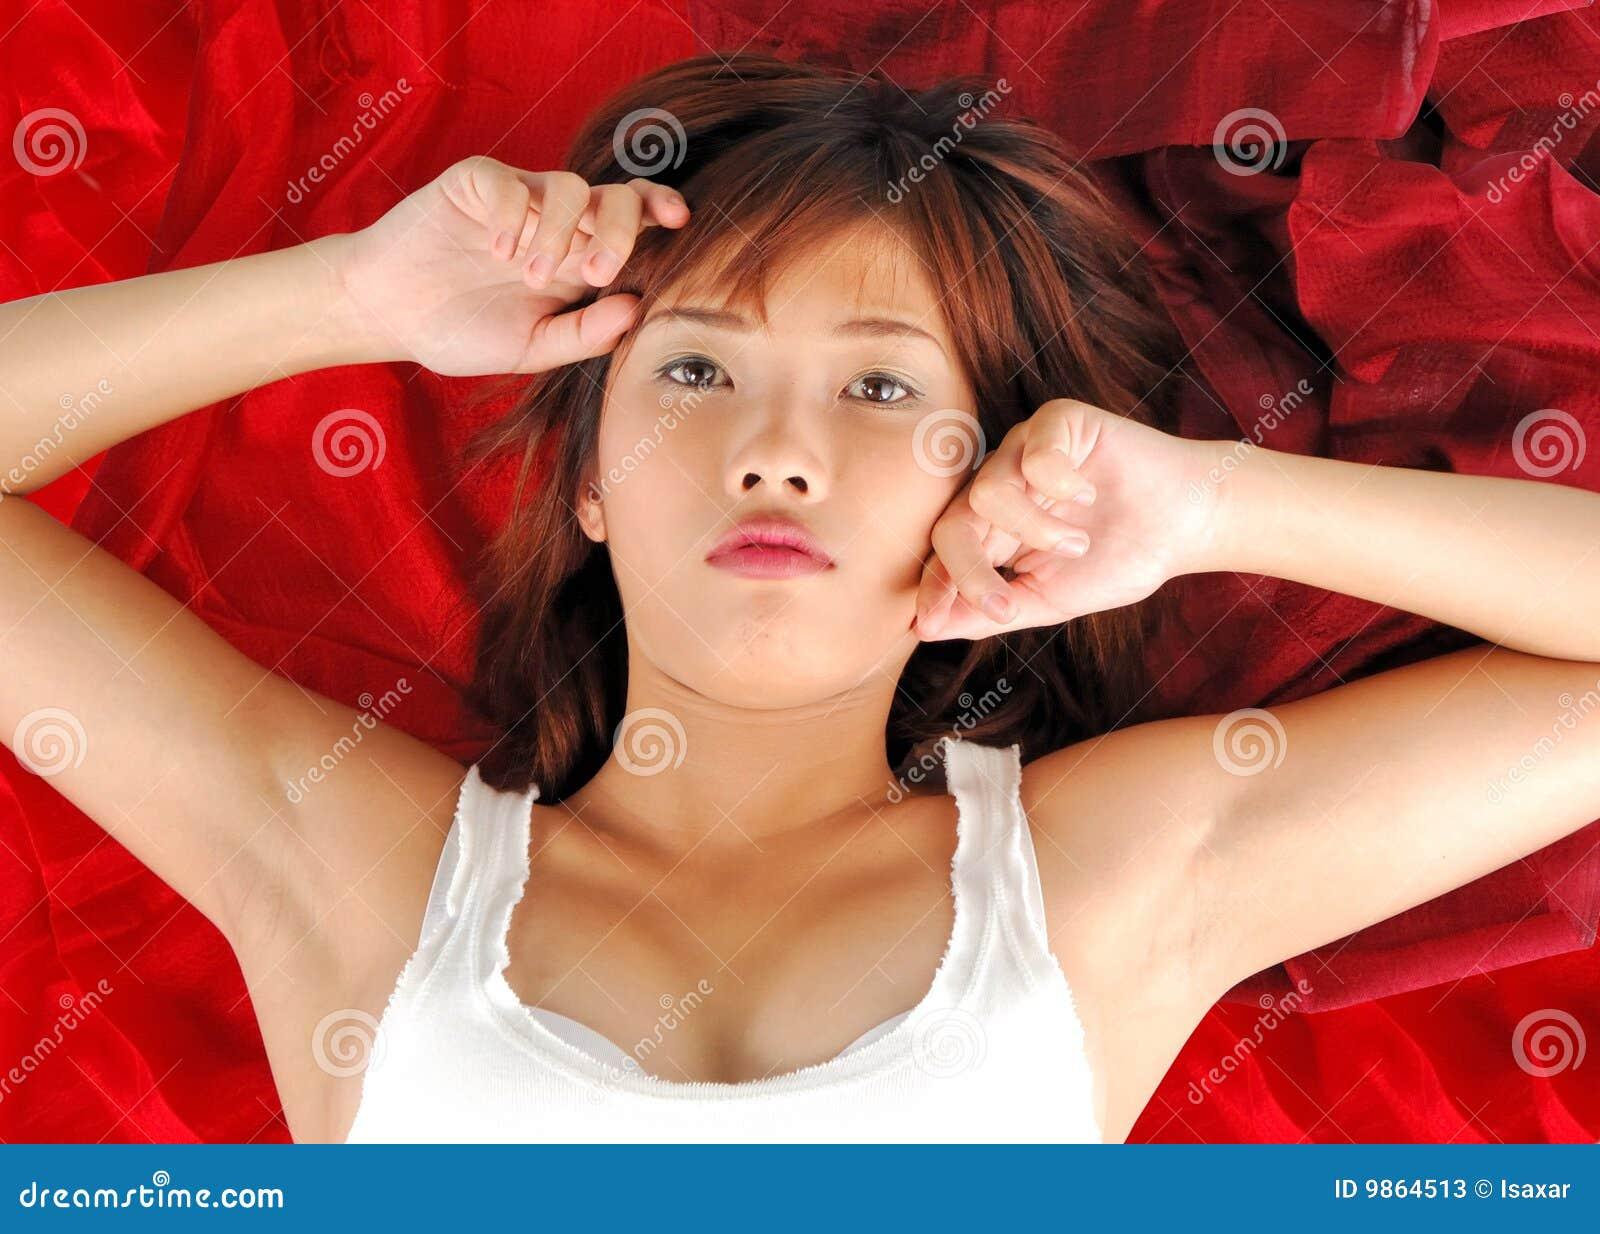 Very Seductive Young Asian Woman Stock Photos Image 9864513